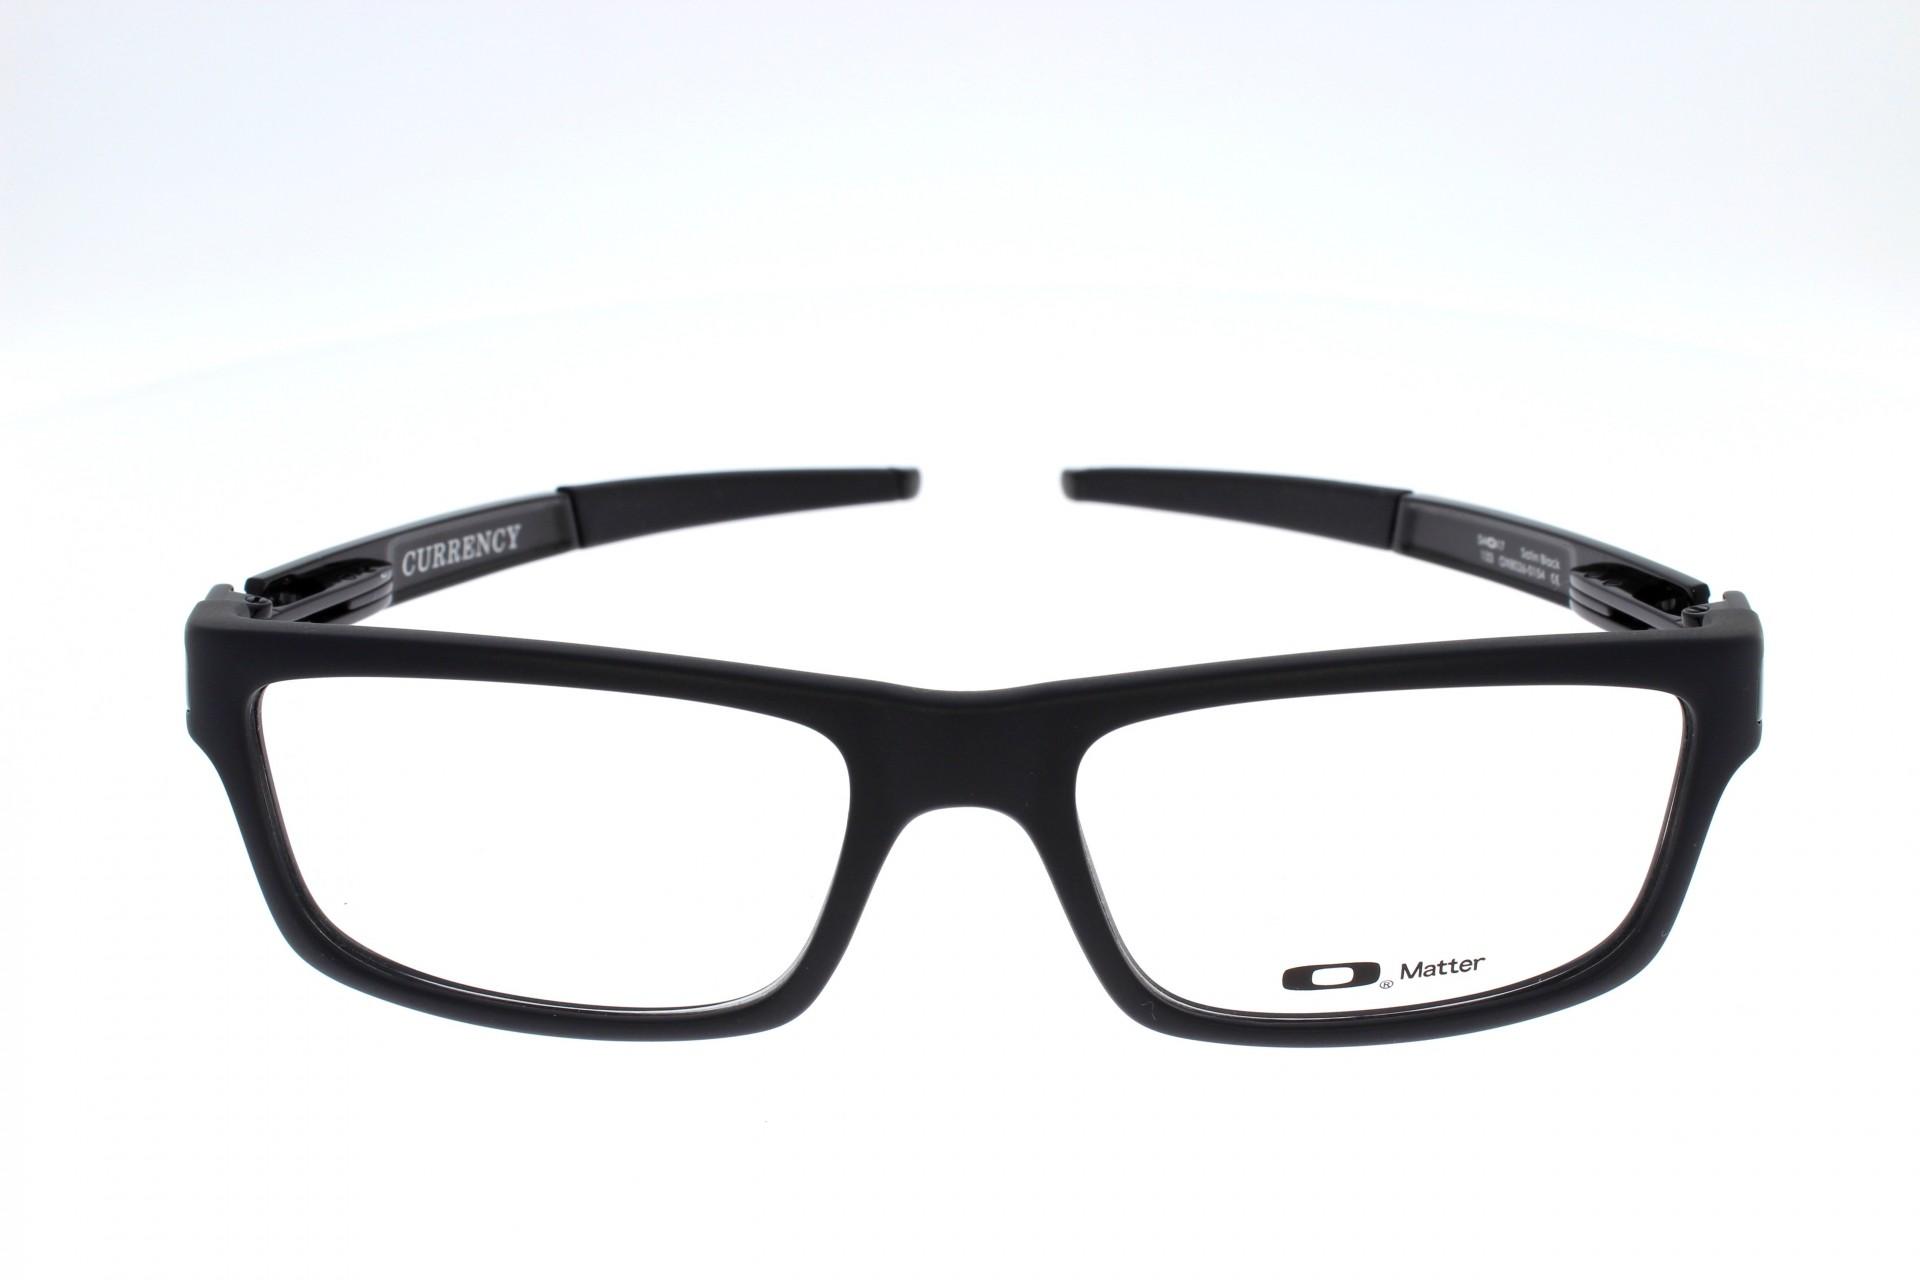 8f1e4bc6db OAKLEY CURRENCY Satin Black OX 8026-01 (54)